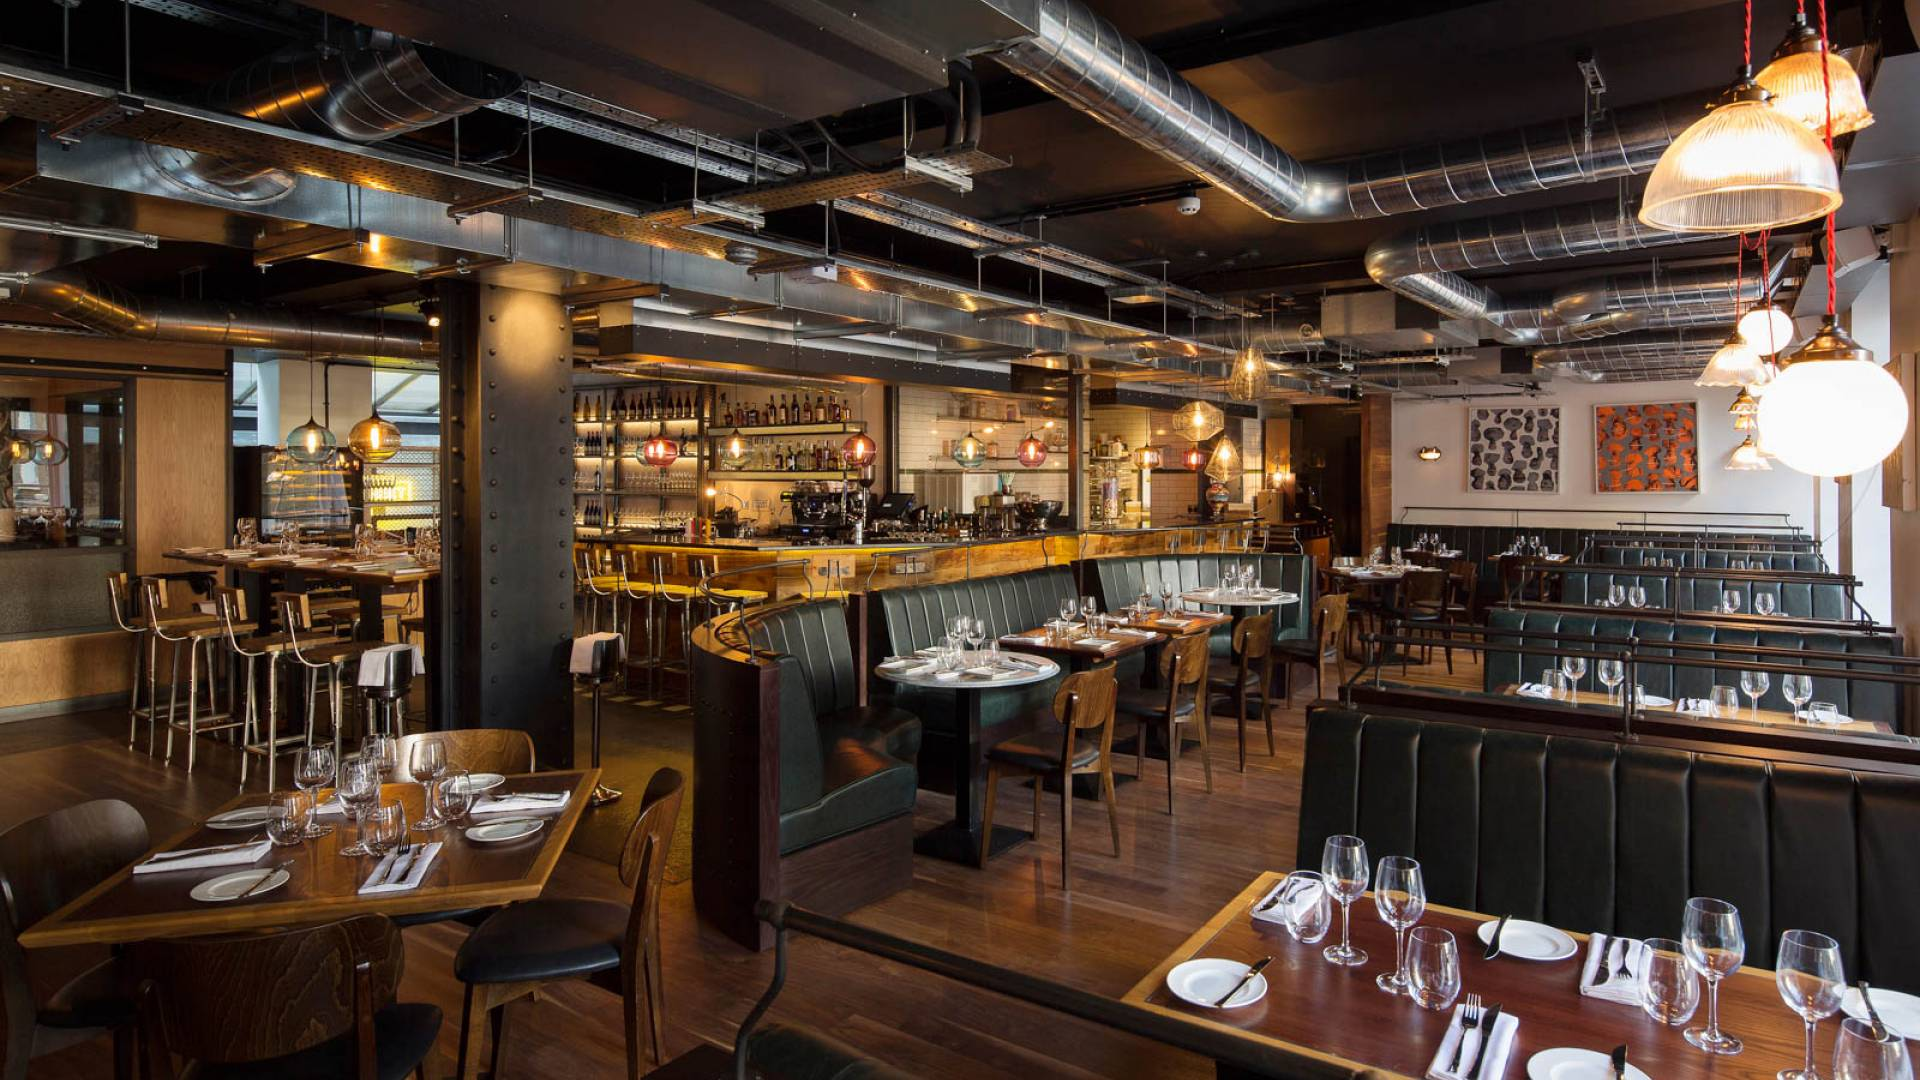 Gallery heddon street kitchen mayfair gordon ramsay